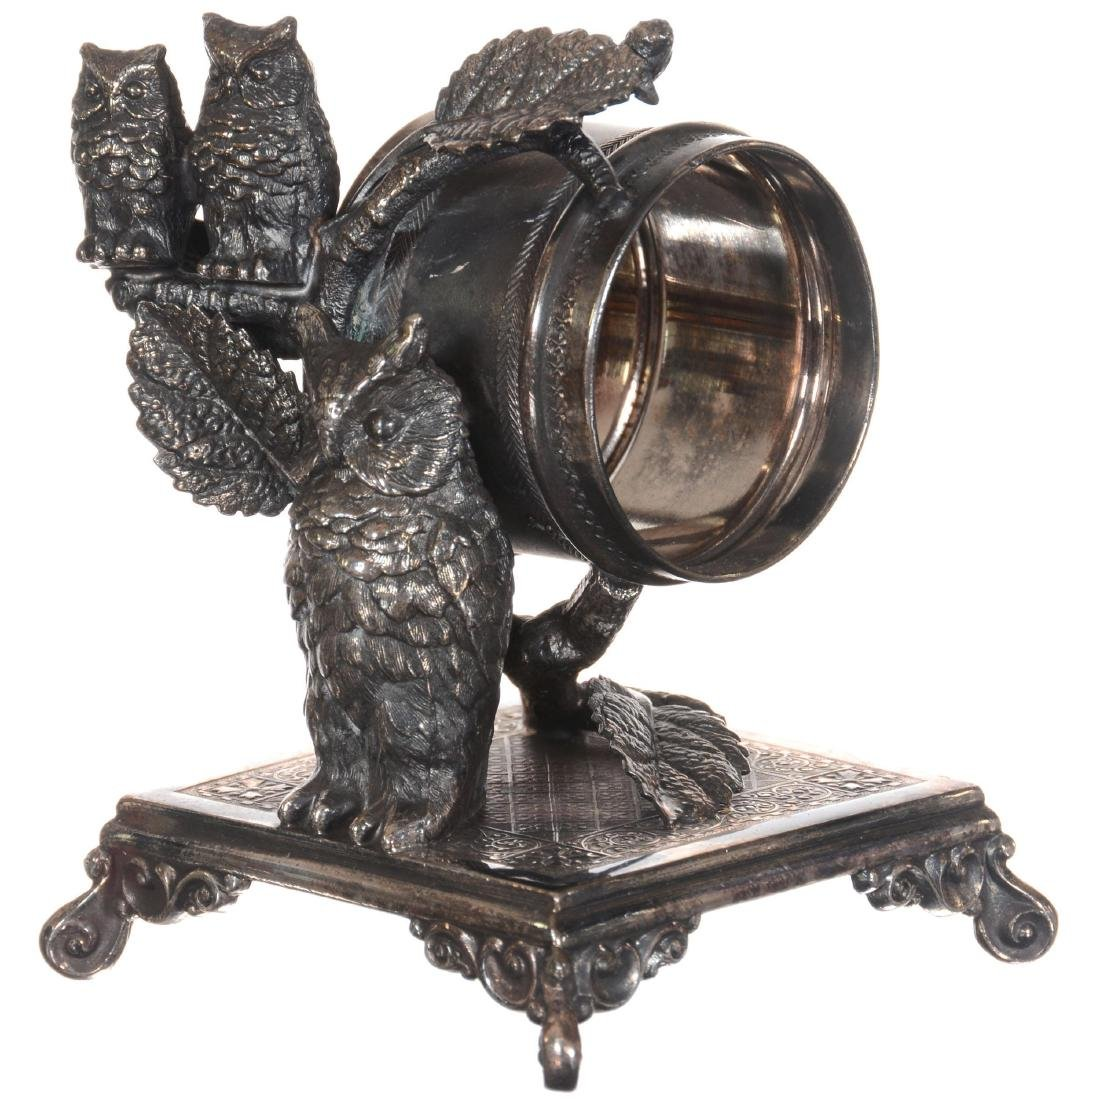 Figural Silver-plate Napkin Ring Holder